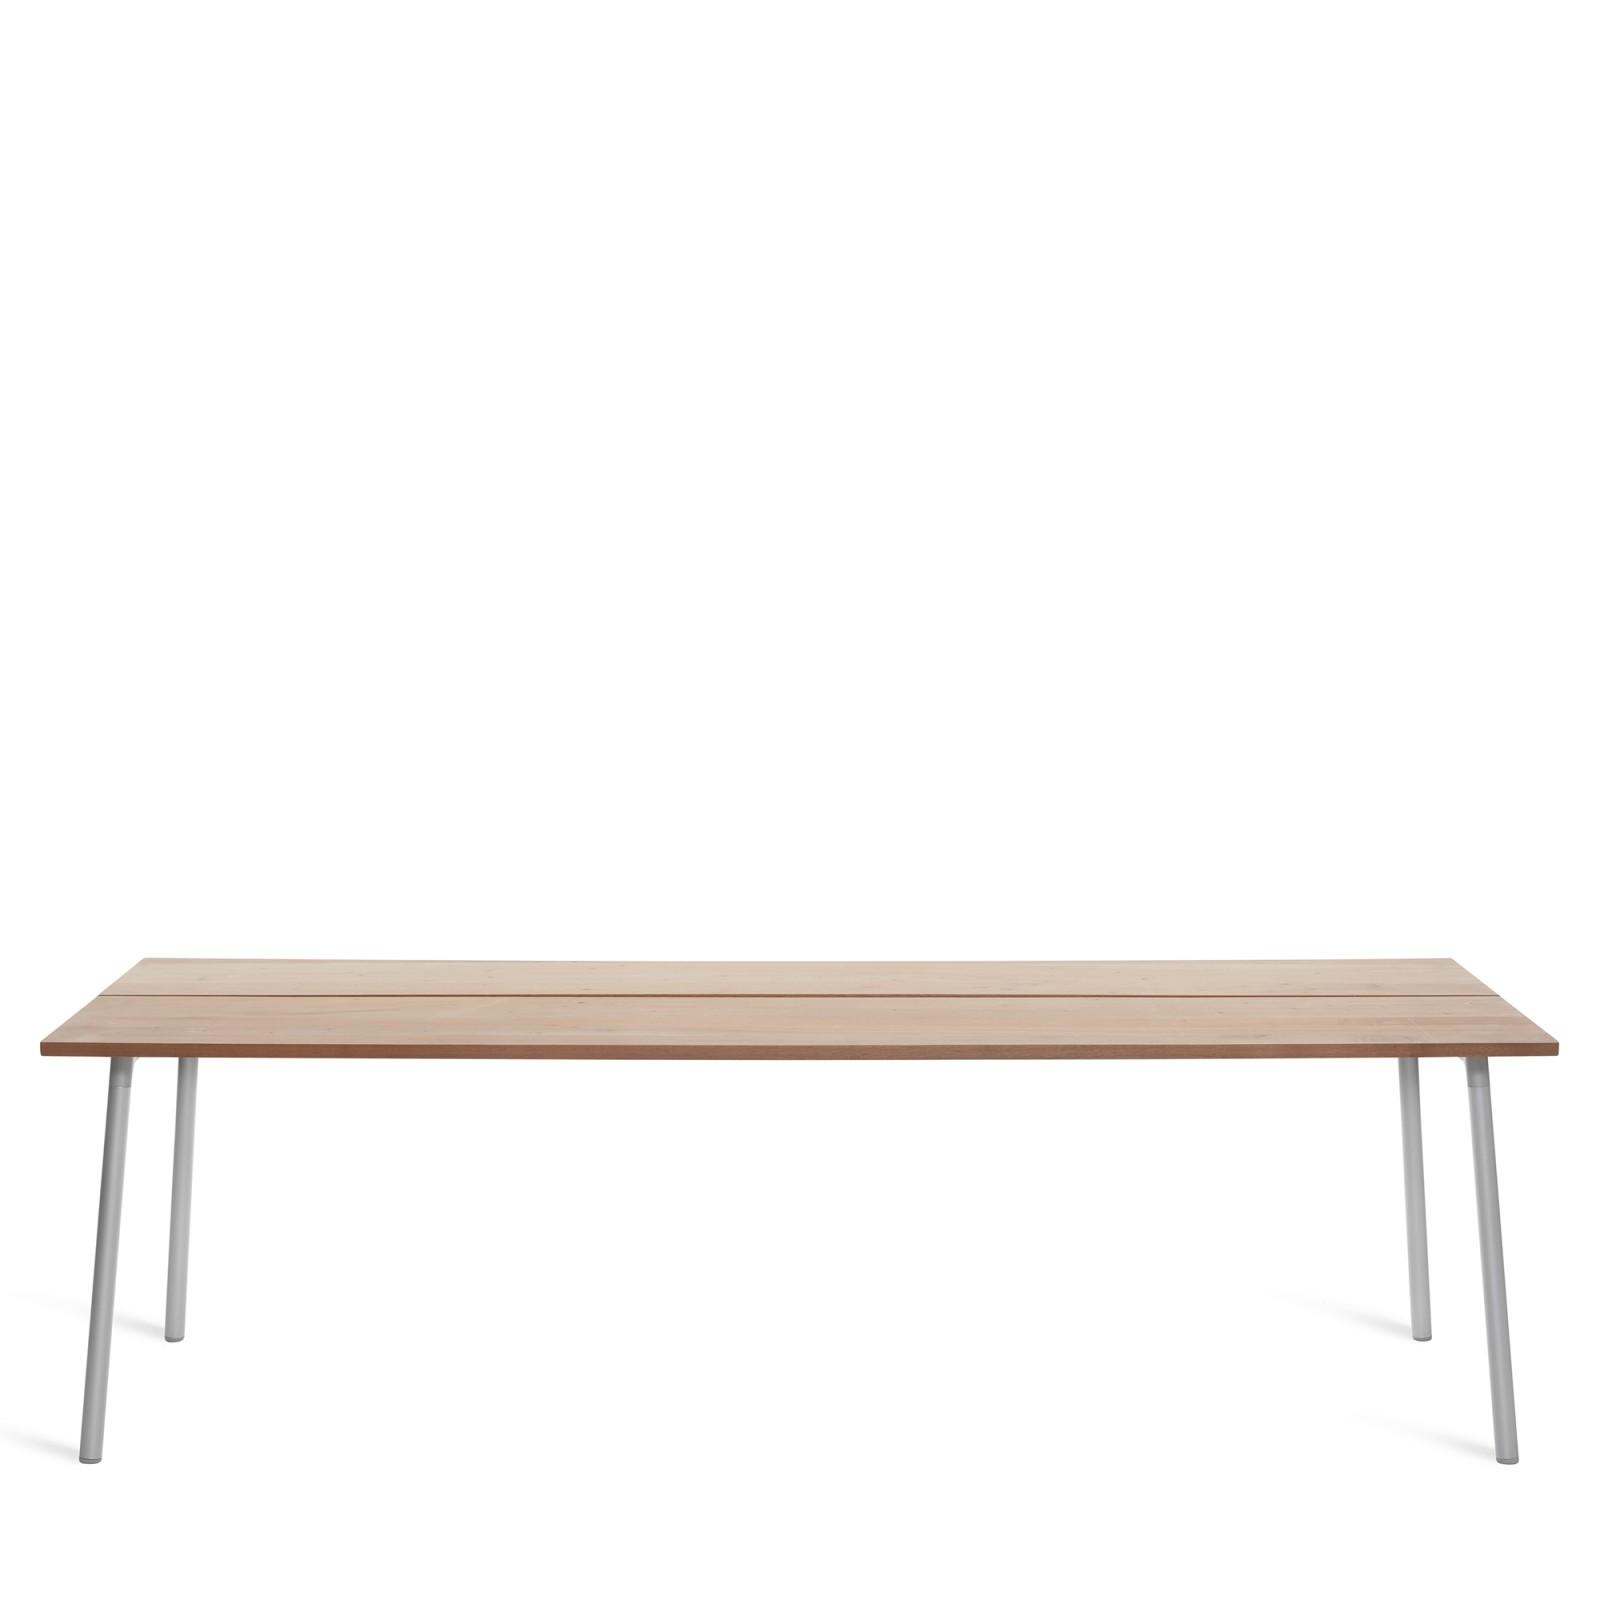 Run Dining Table Rectangular 244cm, Clear Aluminium, Cedar